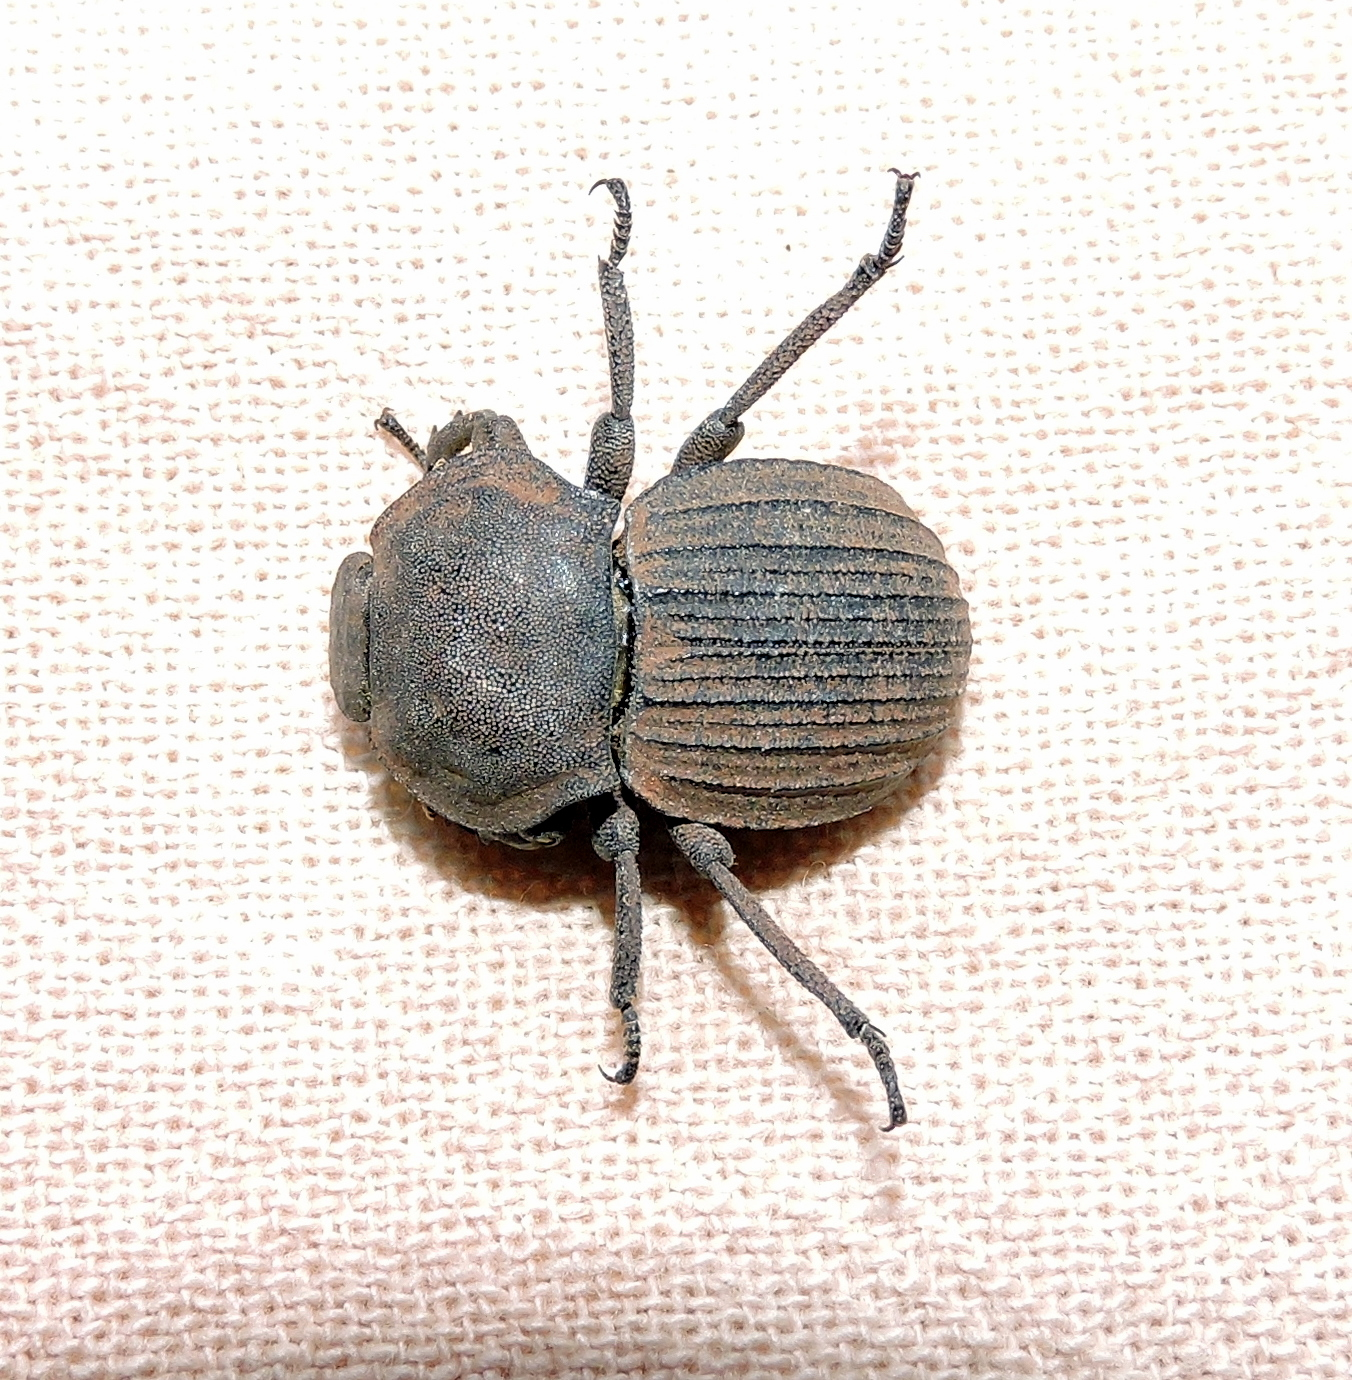 anomalipus-elephas-large-armored-darkling-beetle-copy